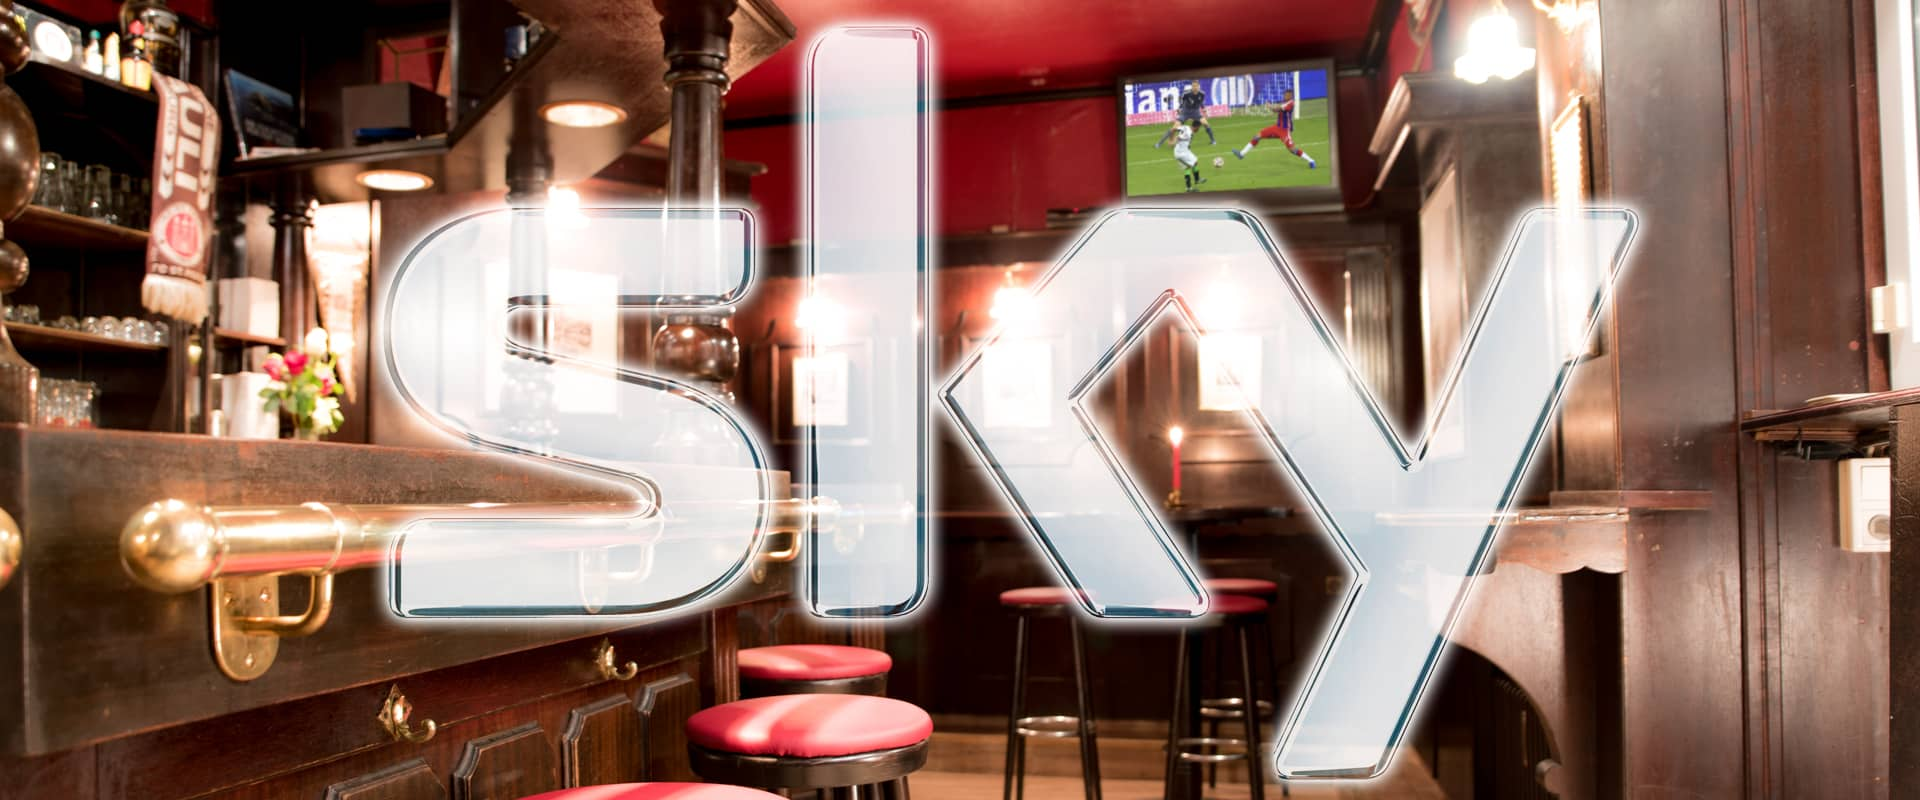 Sky Sportsbar Pinkulus Münster